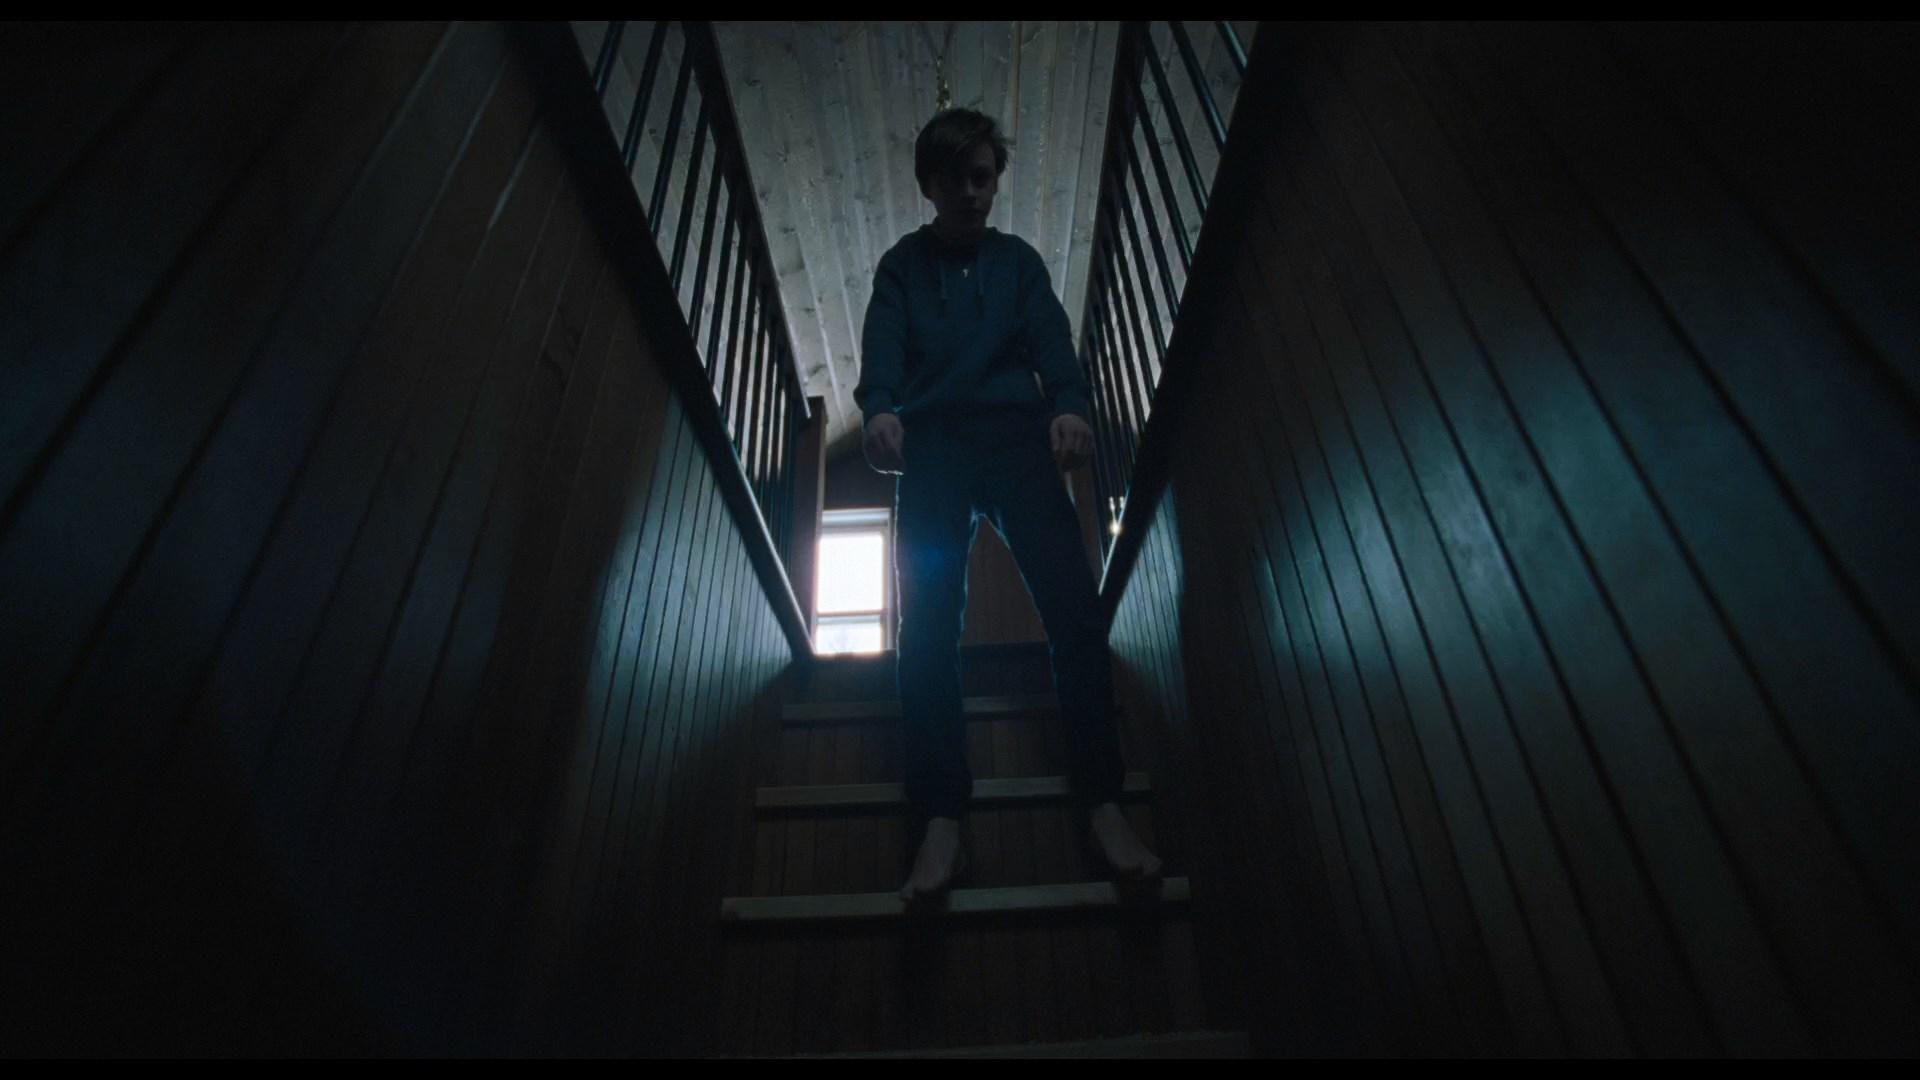 La cabaña siniestra (2019) 1080p BRrip Latino